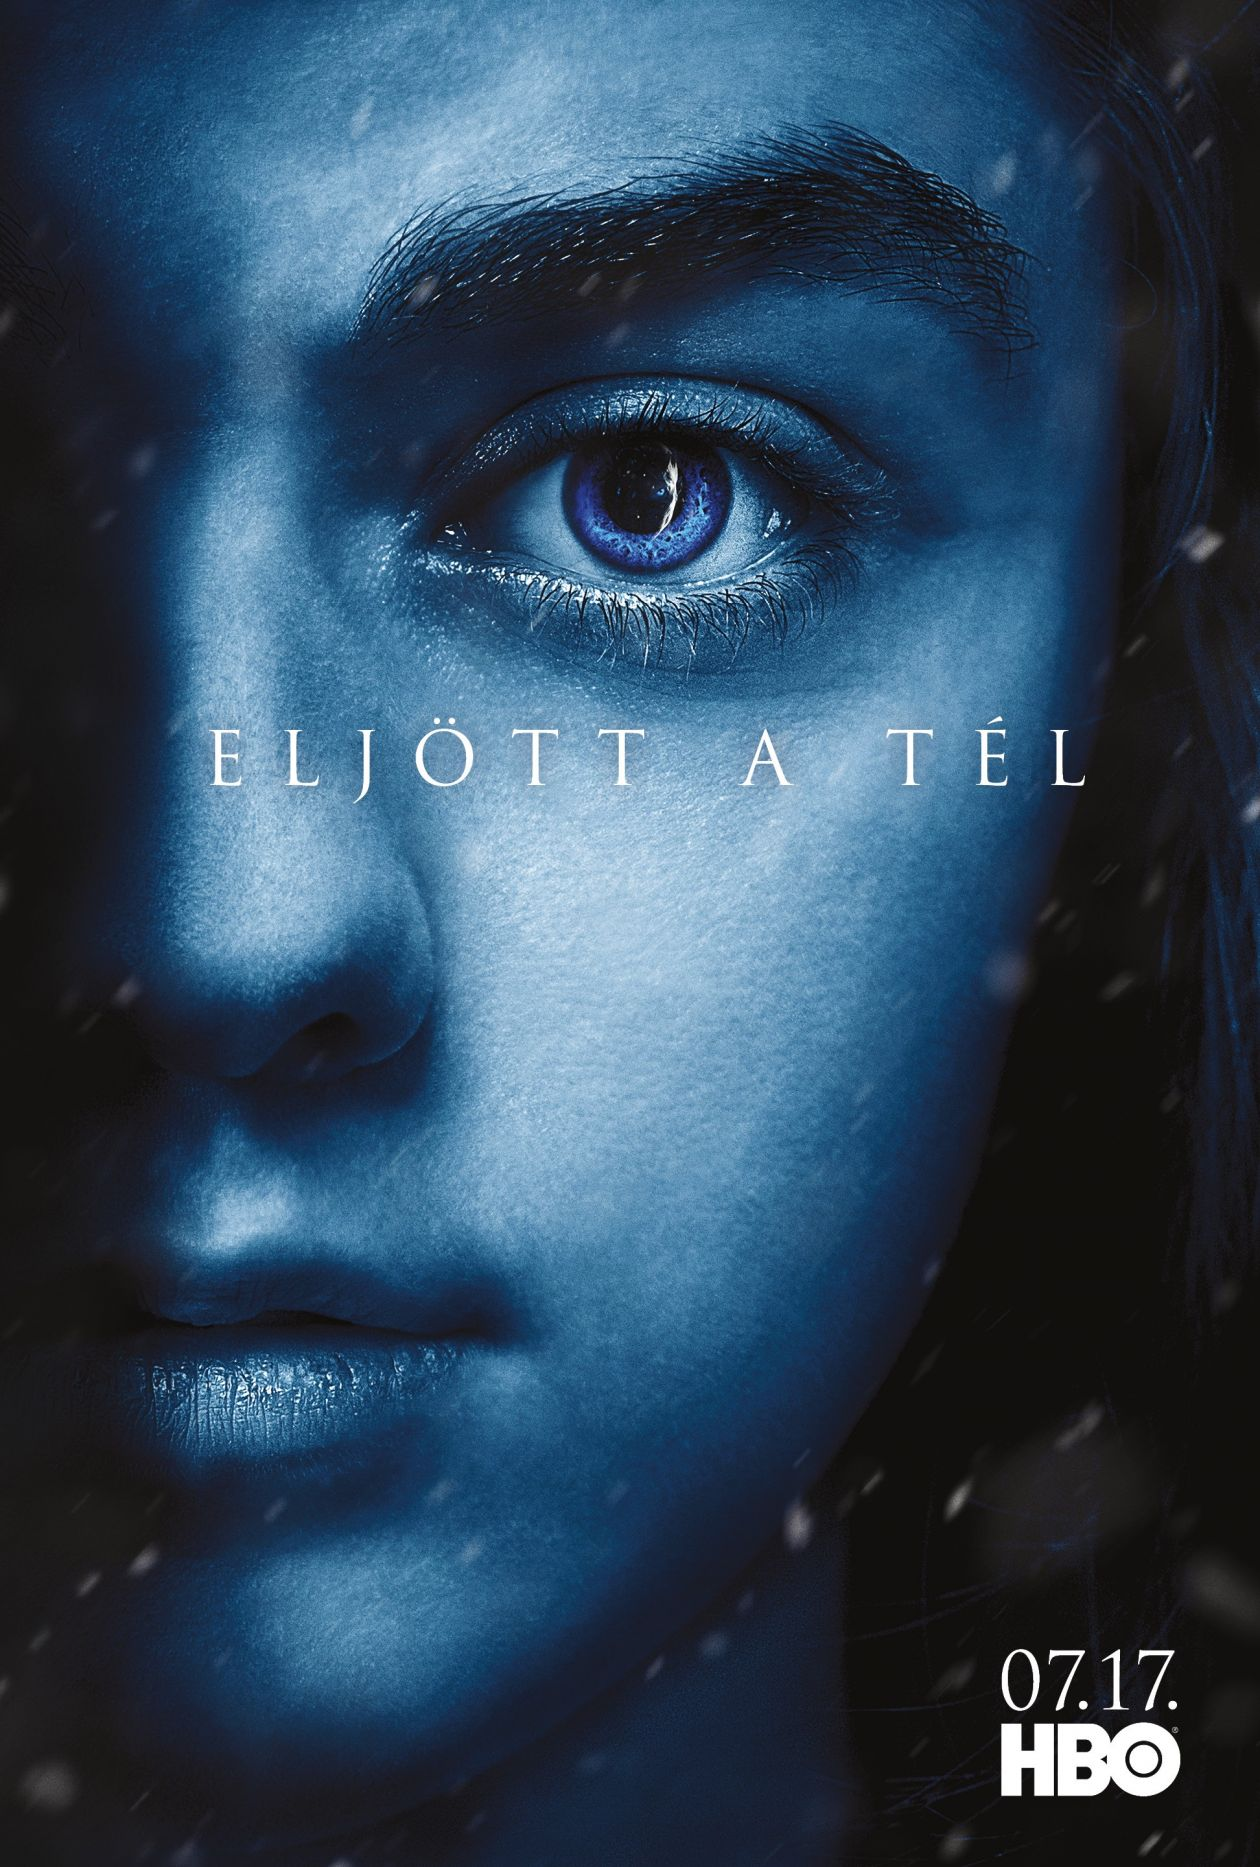 Maisie Williams actress : Arya Stark  Game of Thrones : Series Poster Season 7 2017